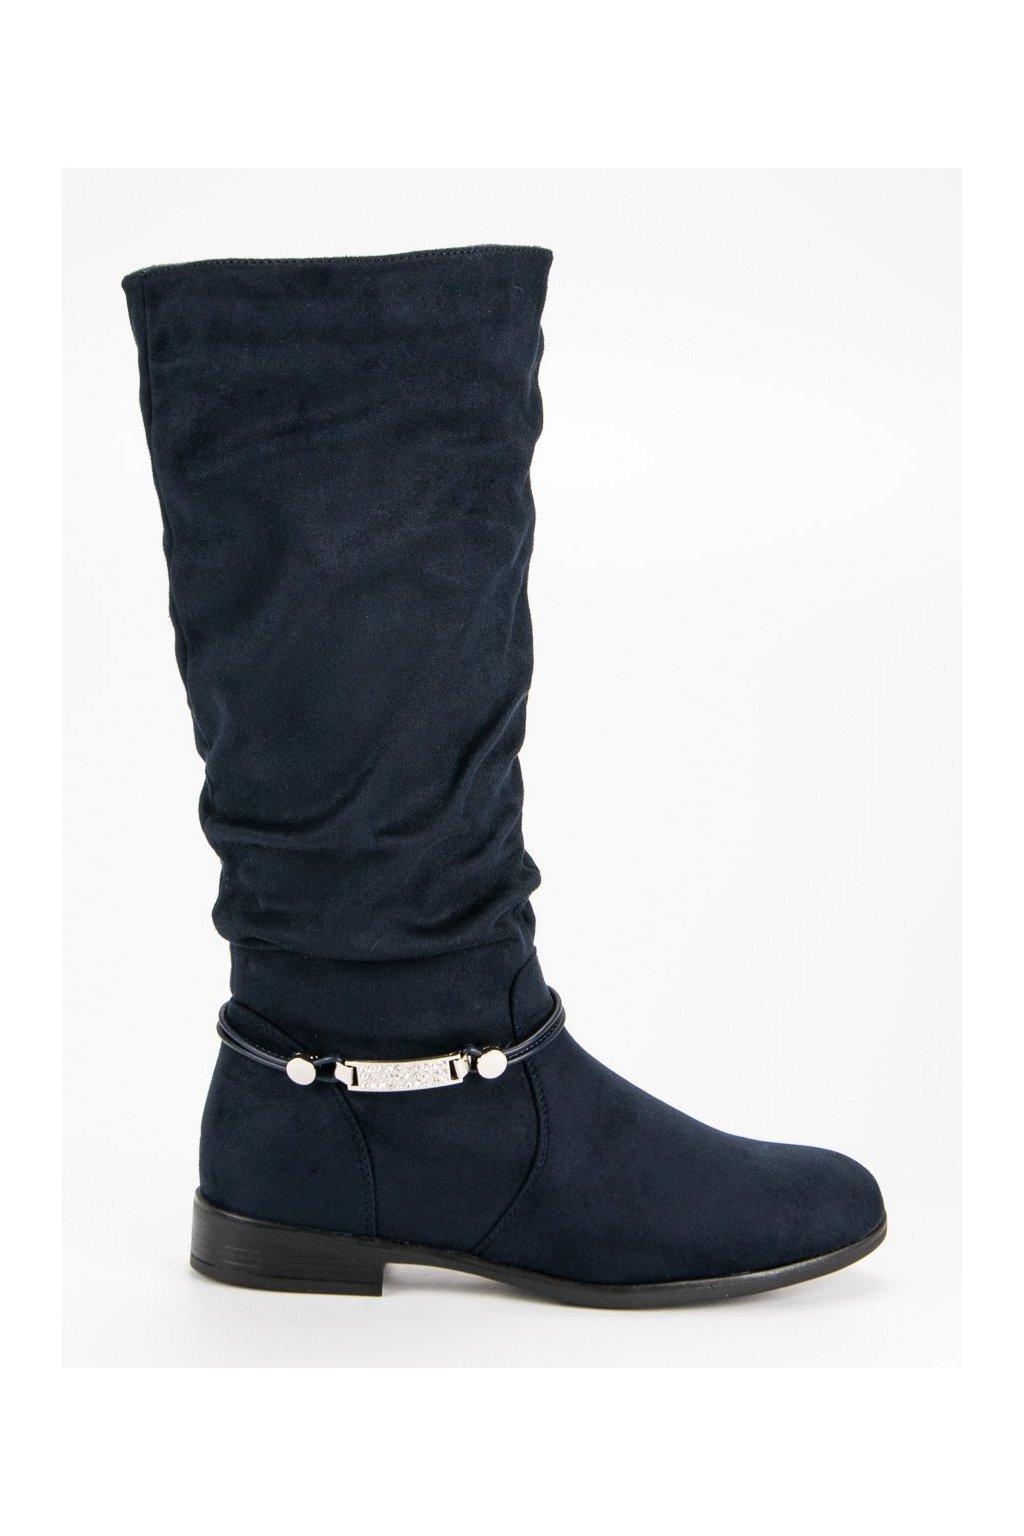 Tmavo modré čižmy pod kolena SDS e6e2ae156a4